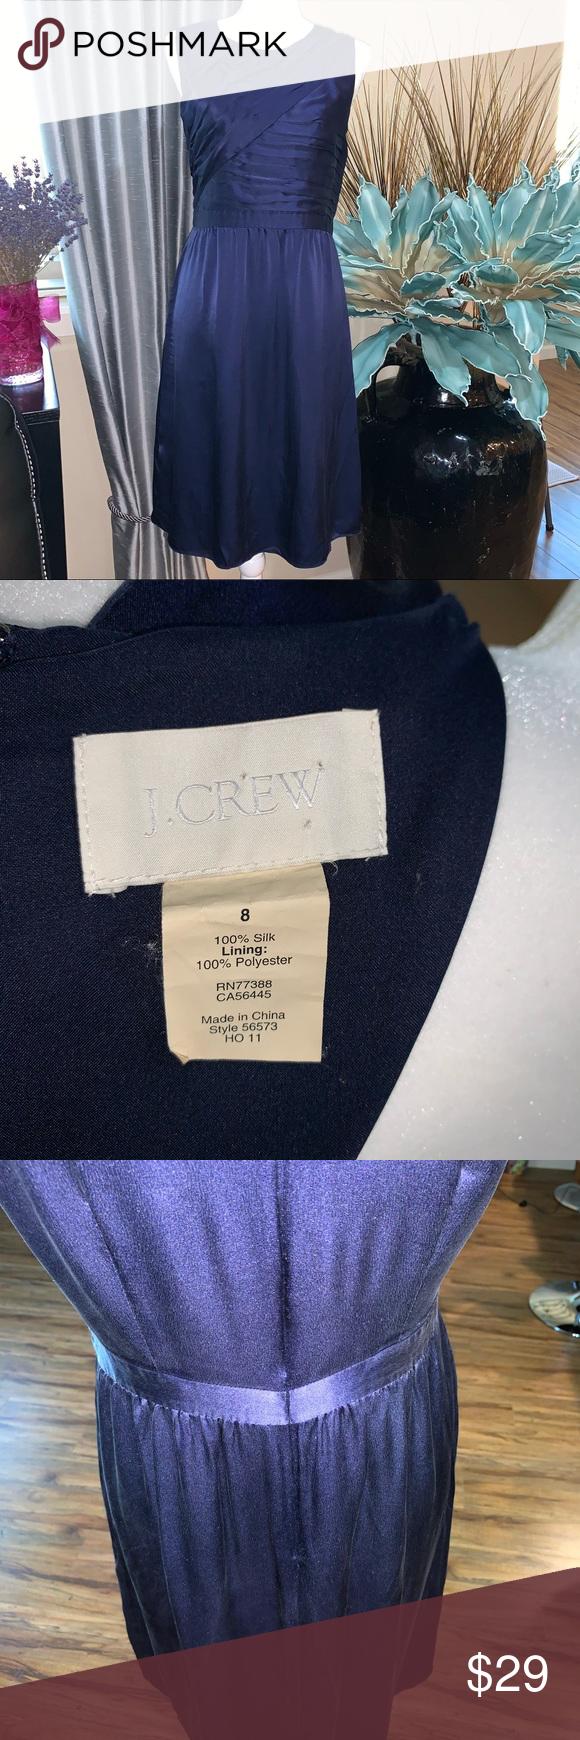 J.Crew 100% silk dark blue dress.